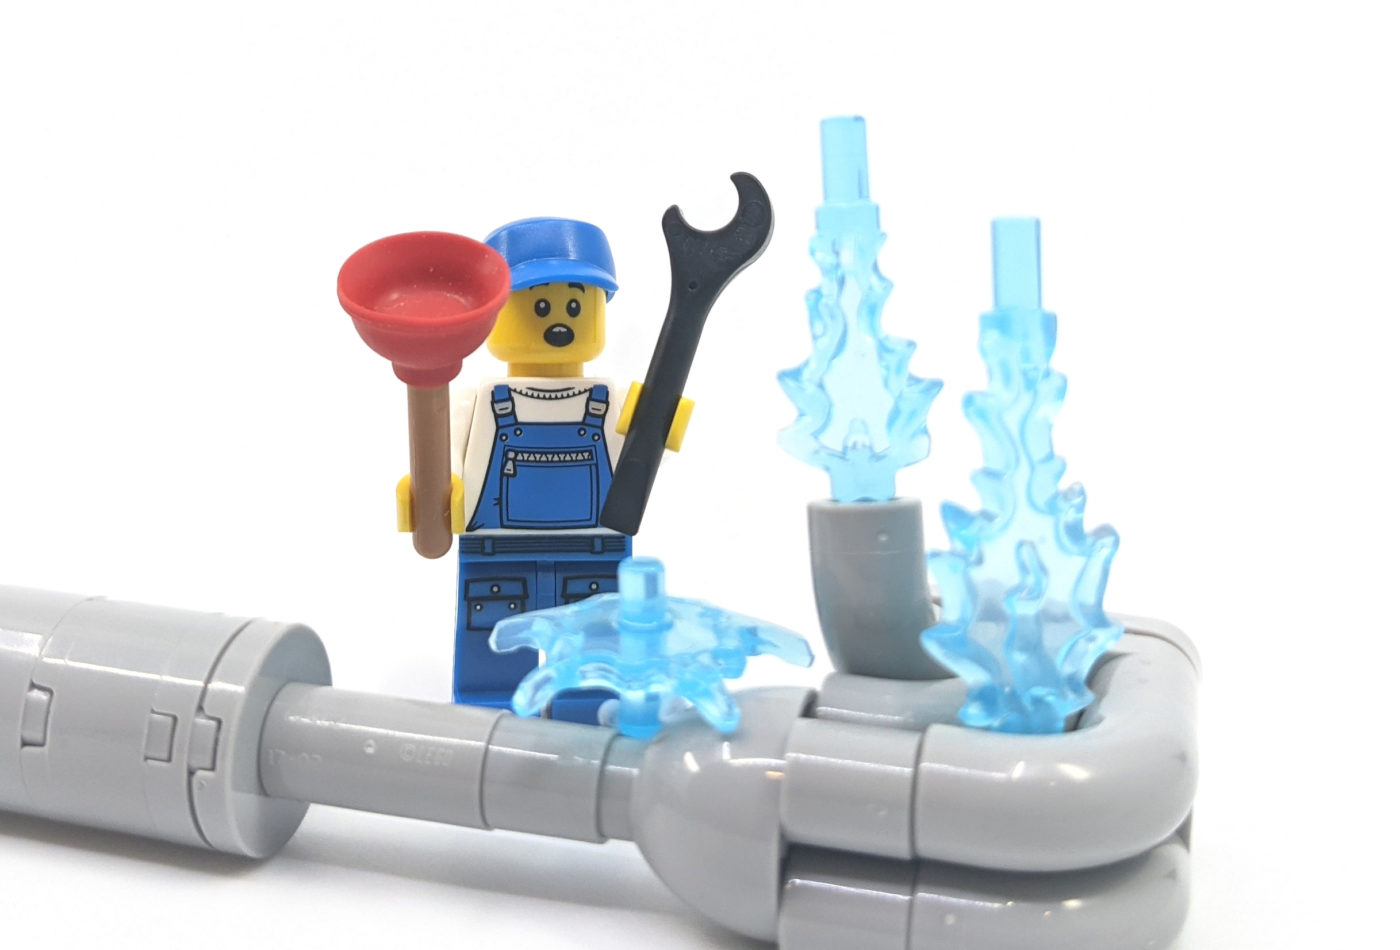 LEGOleaks